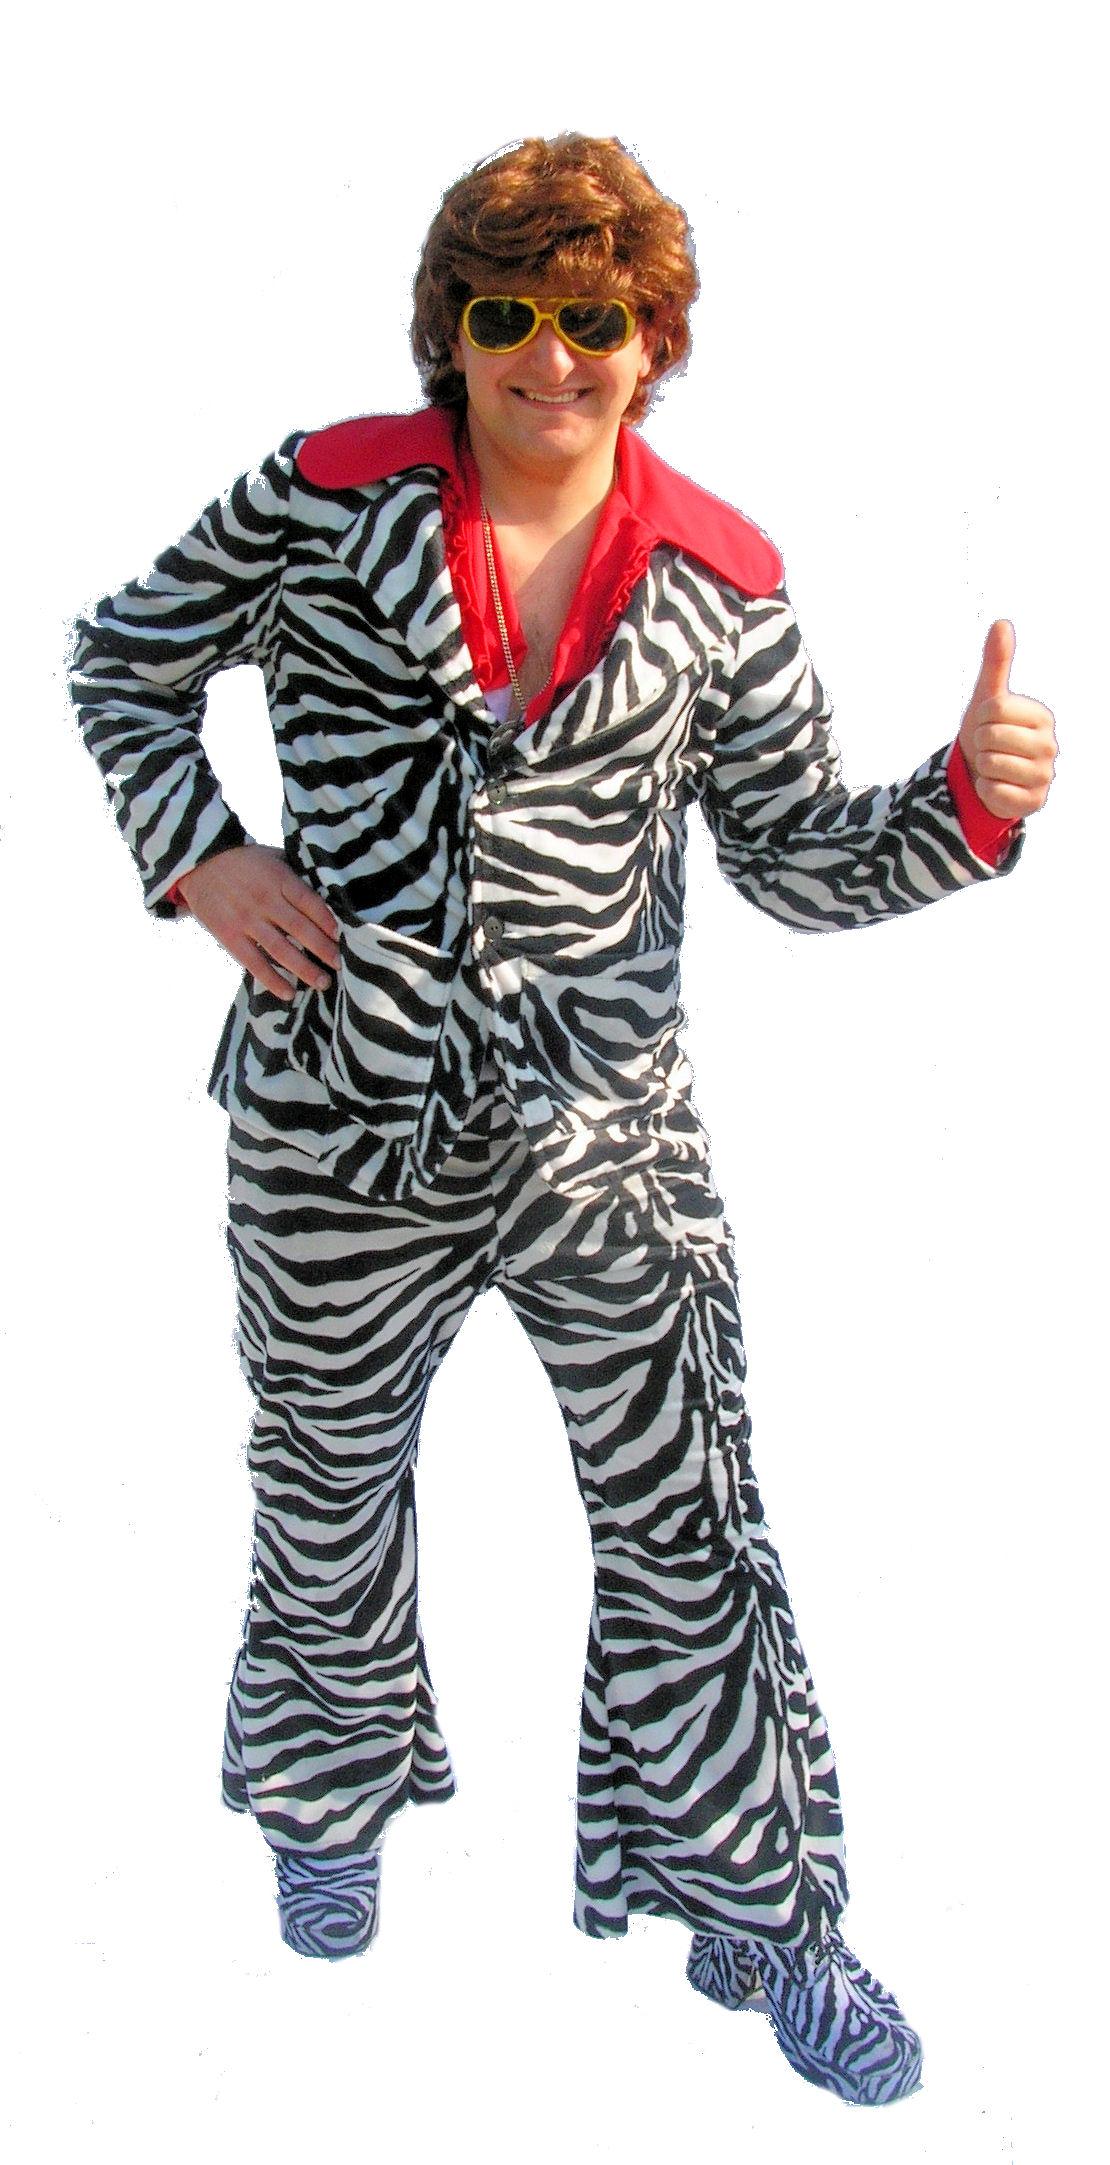 Zebra-Print-Pimp-Suit